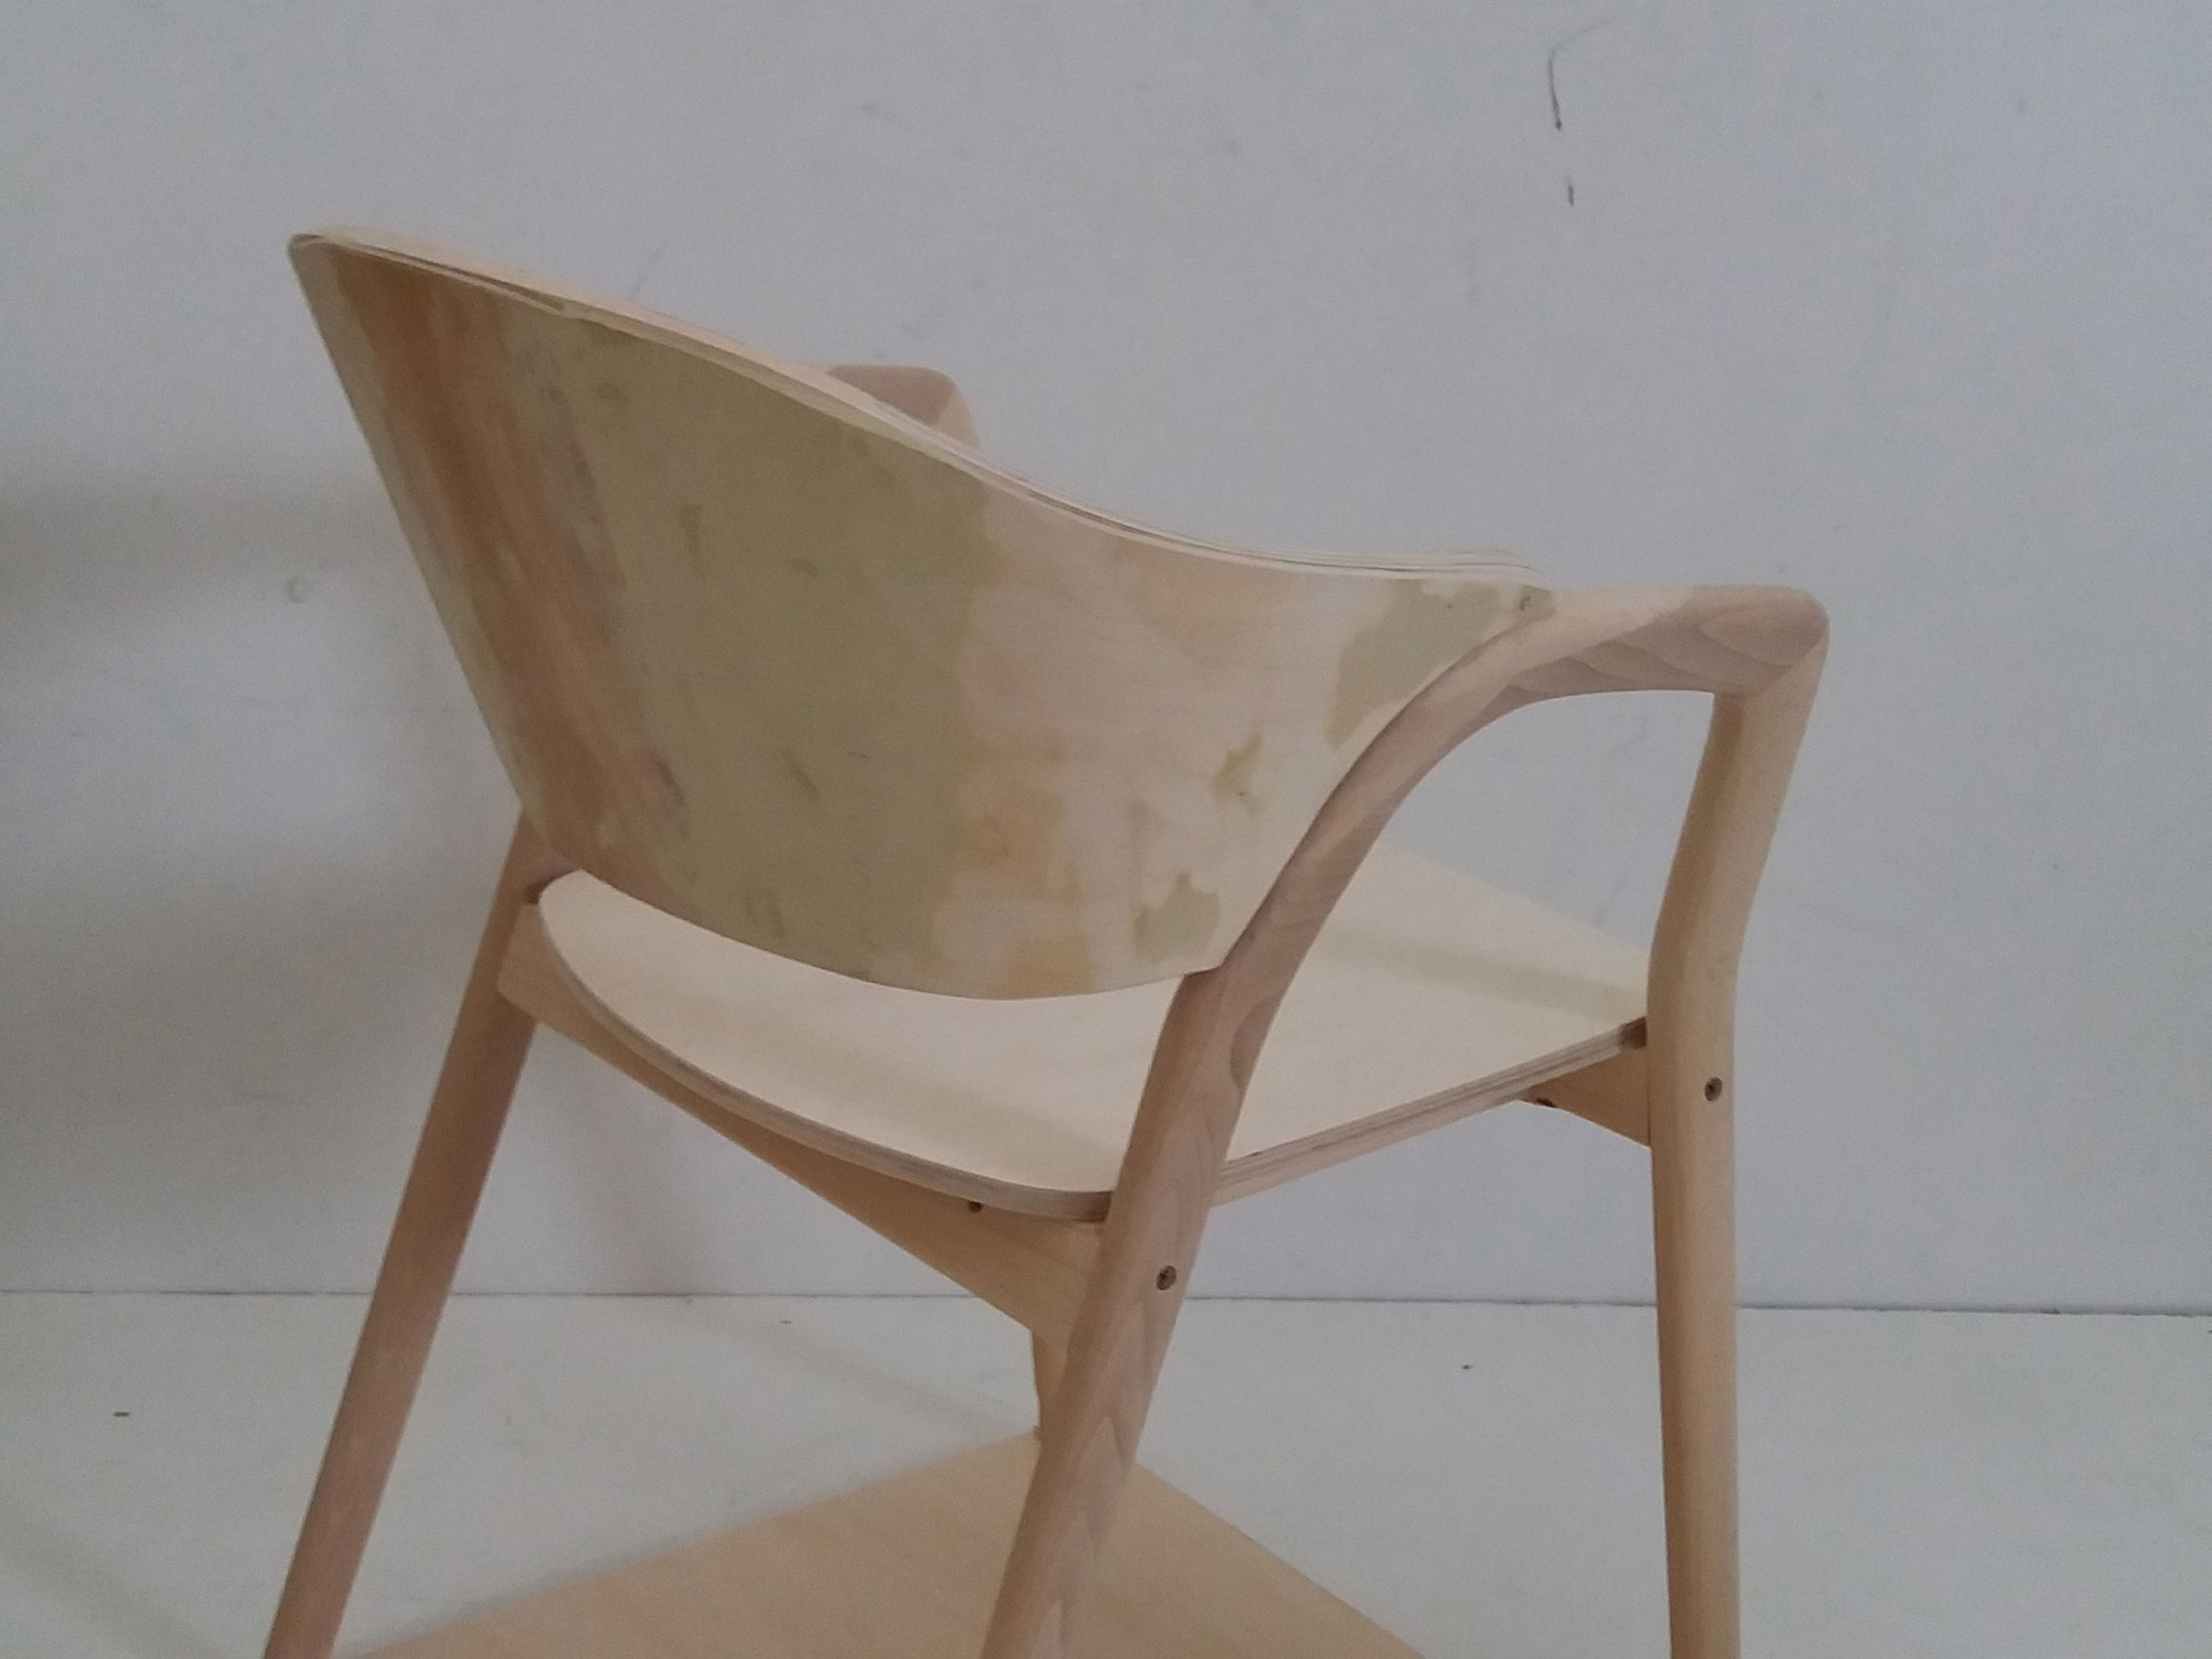 VERY_WOOD_CAMDEN_armchair_mof_120926_web.jpg